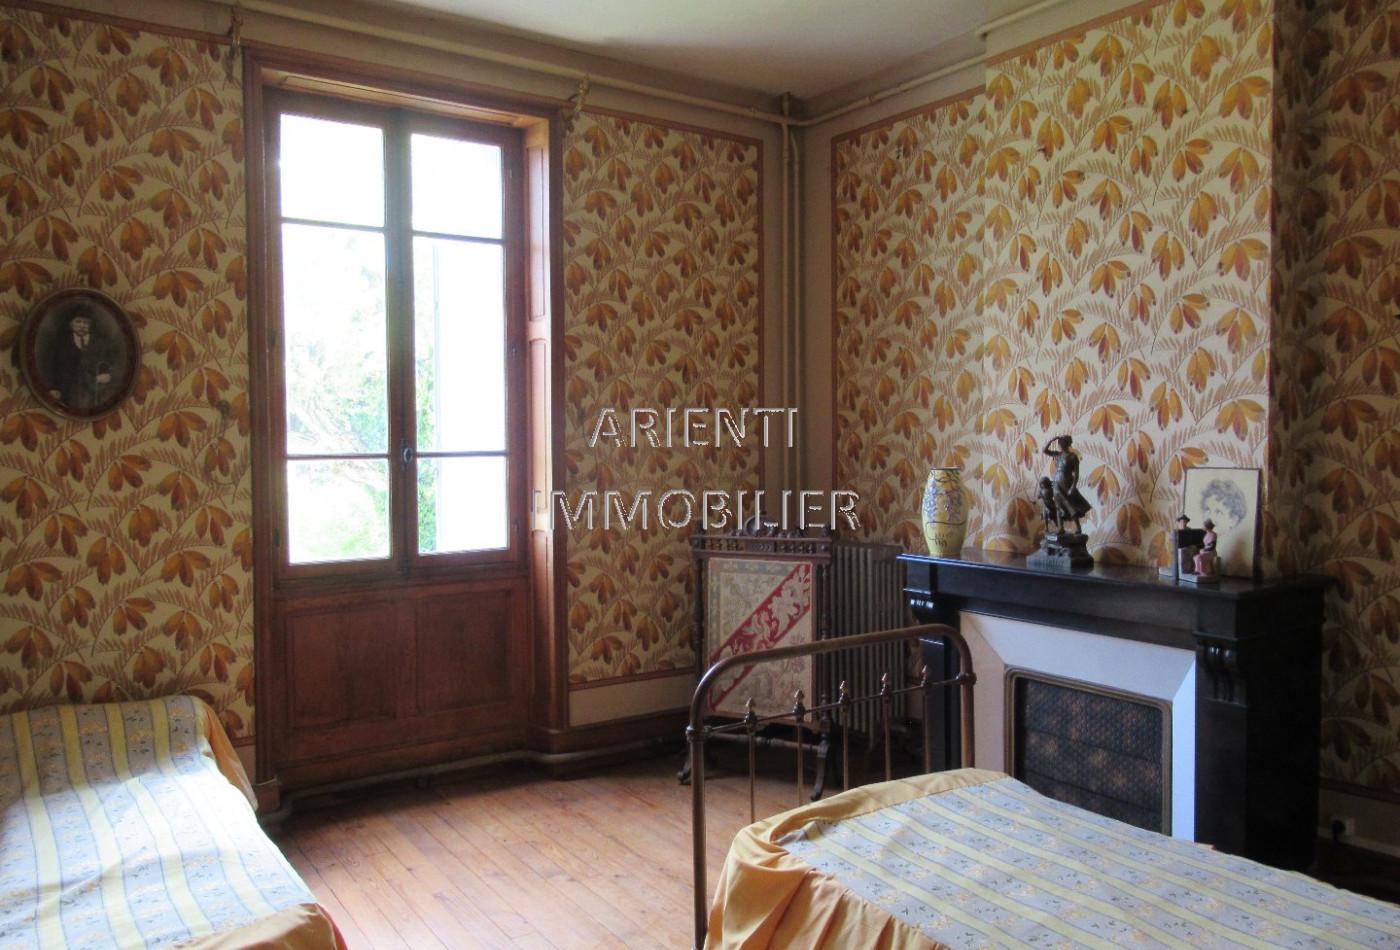 A vendre Dieulefit 260013034 Office immobilier arienti